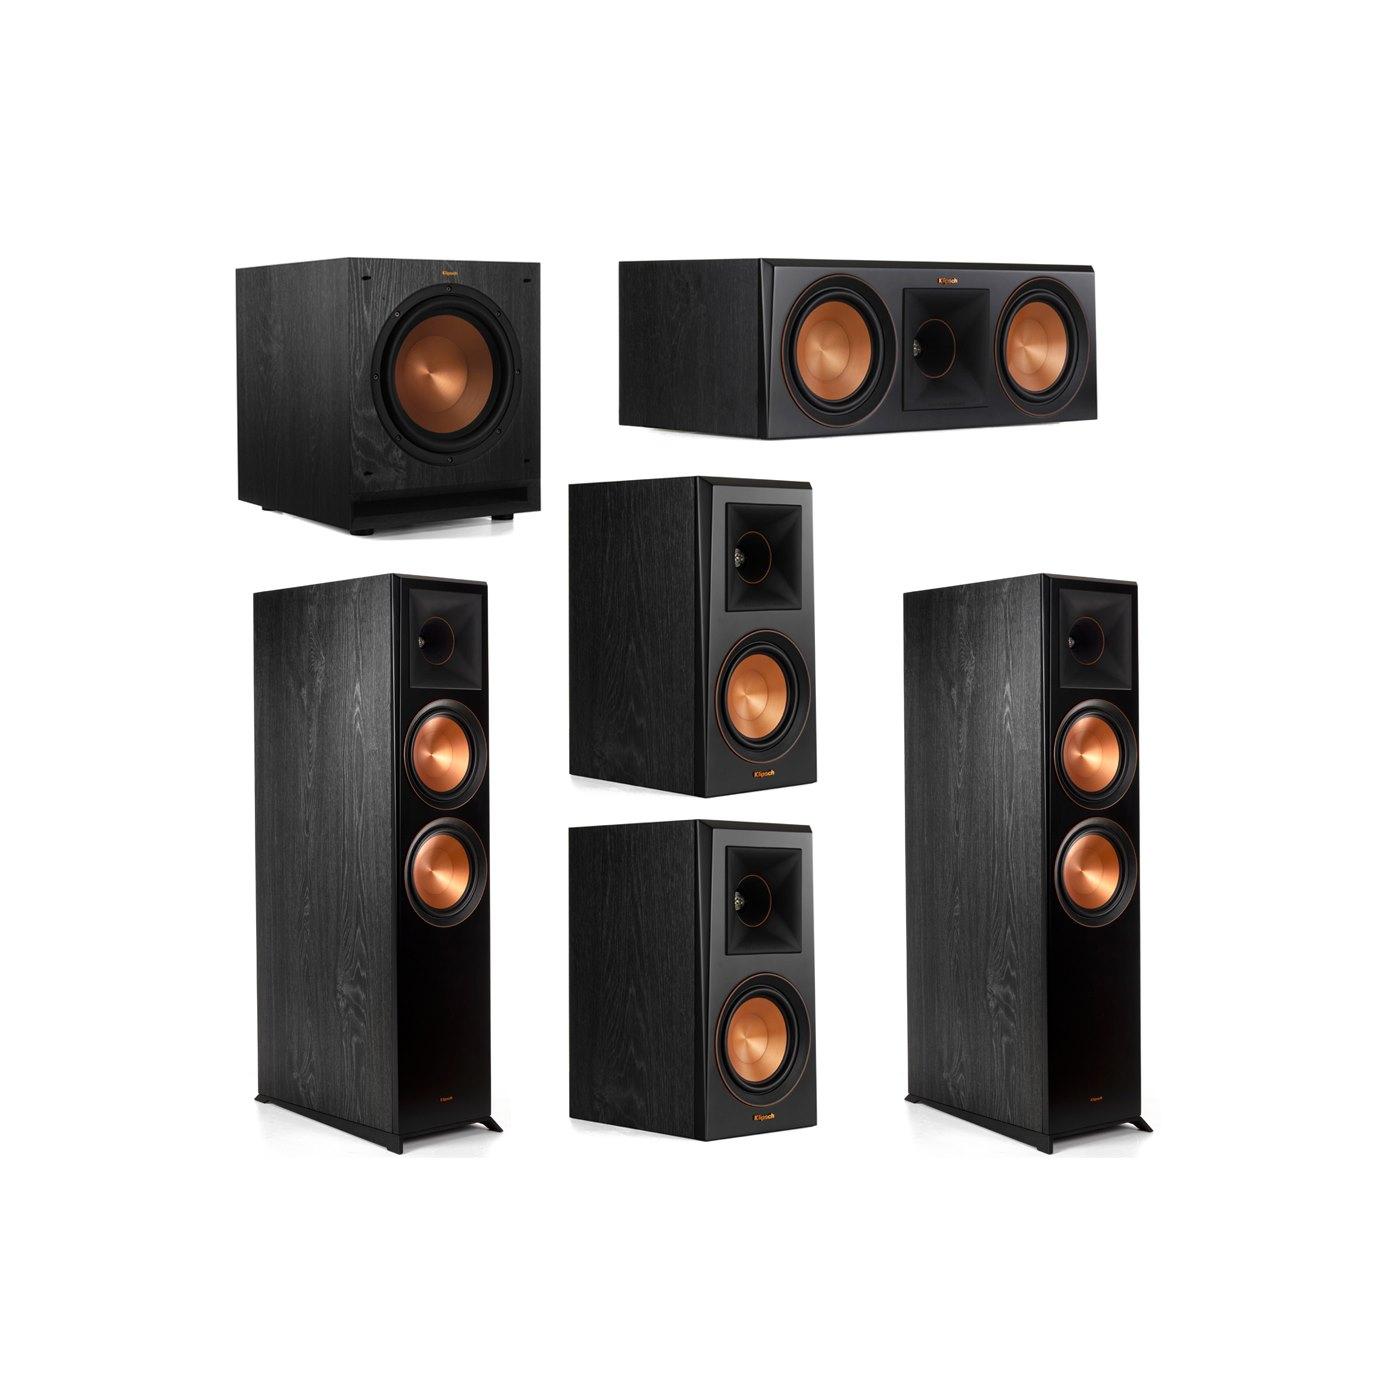 Klipsch 5.1 System with 2 RP-8000F Floorstanding Speakers, 1 Klipsch RP-600C Center Speaker, 2 Klipsch RP-500M Surround Speakers, 1 Klipsch SPL-100 Subwoofer